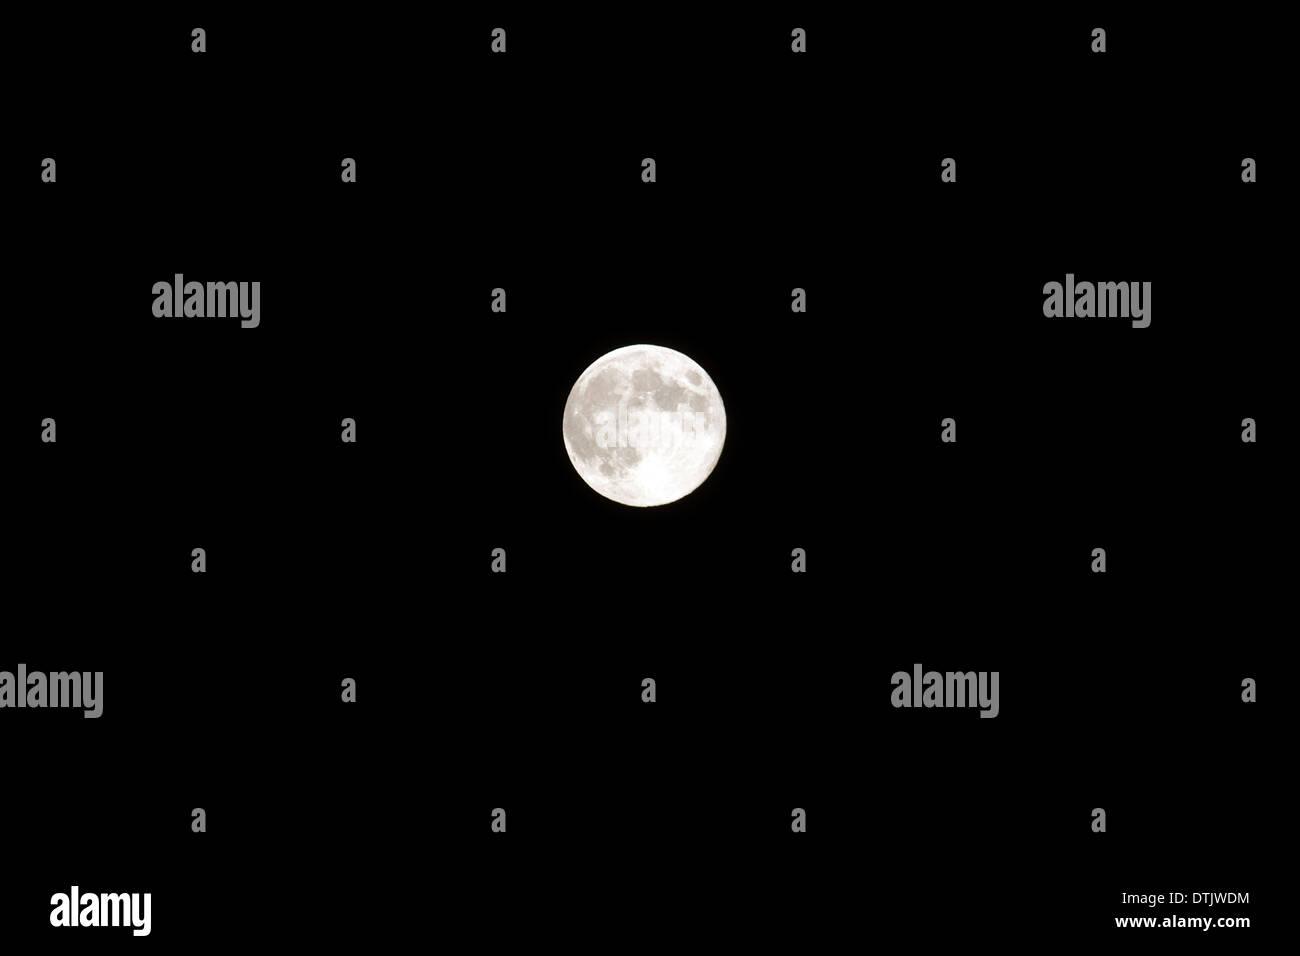 Full moon in the night sky. - Stock Image